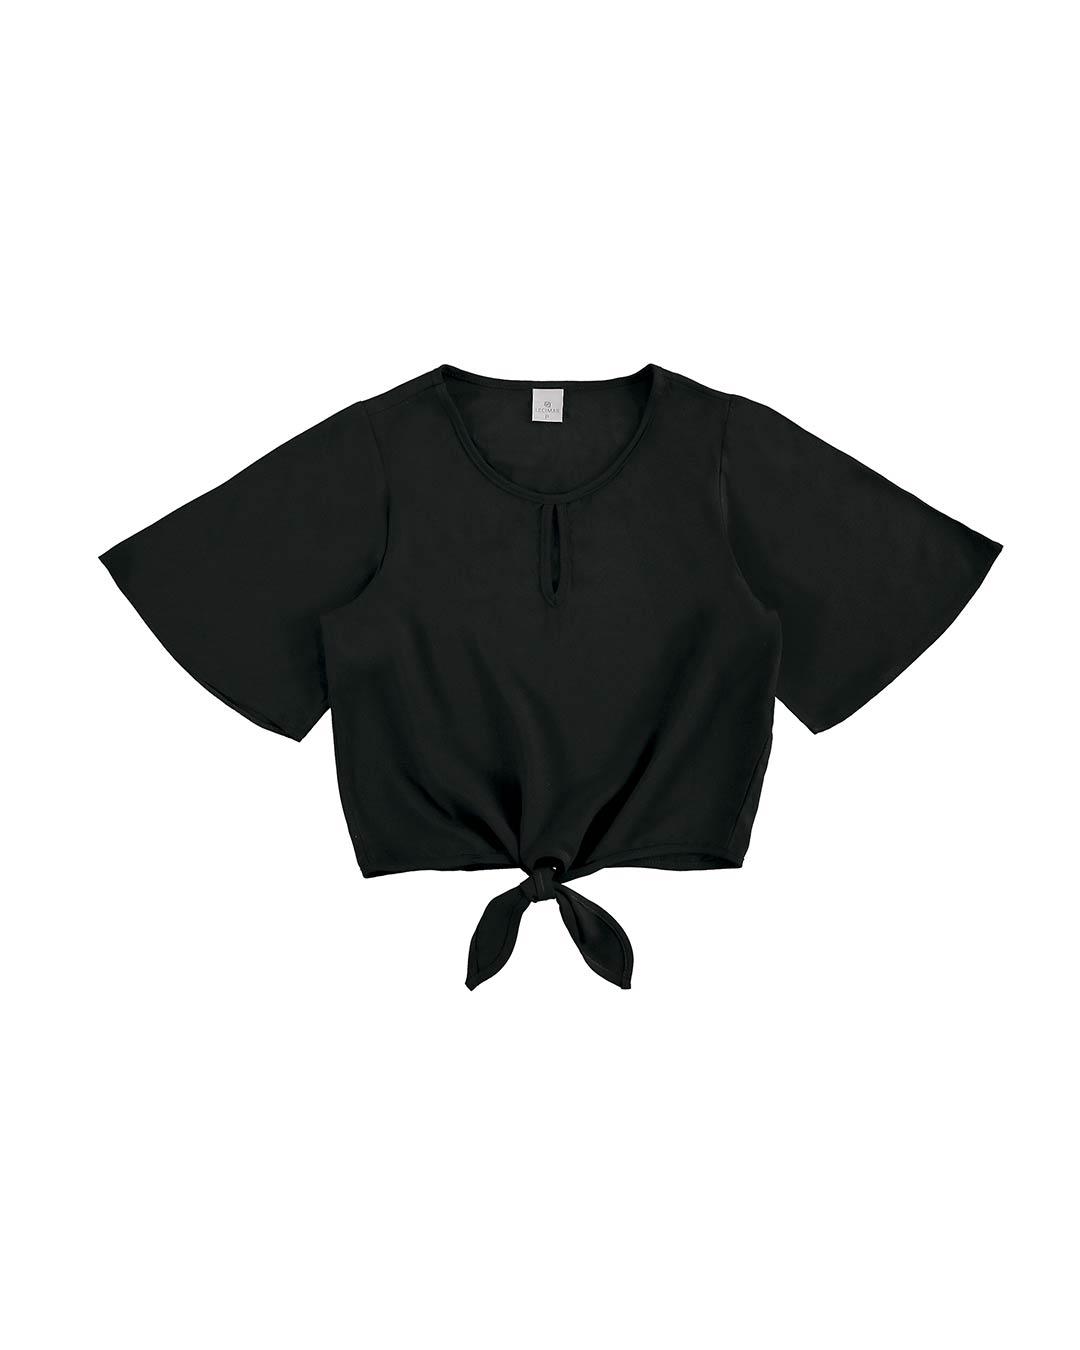 Blusa Feminina Lisa e Listras- Lecimar